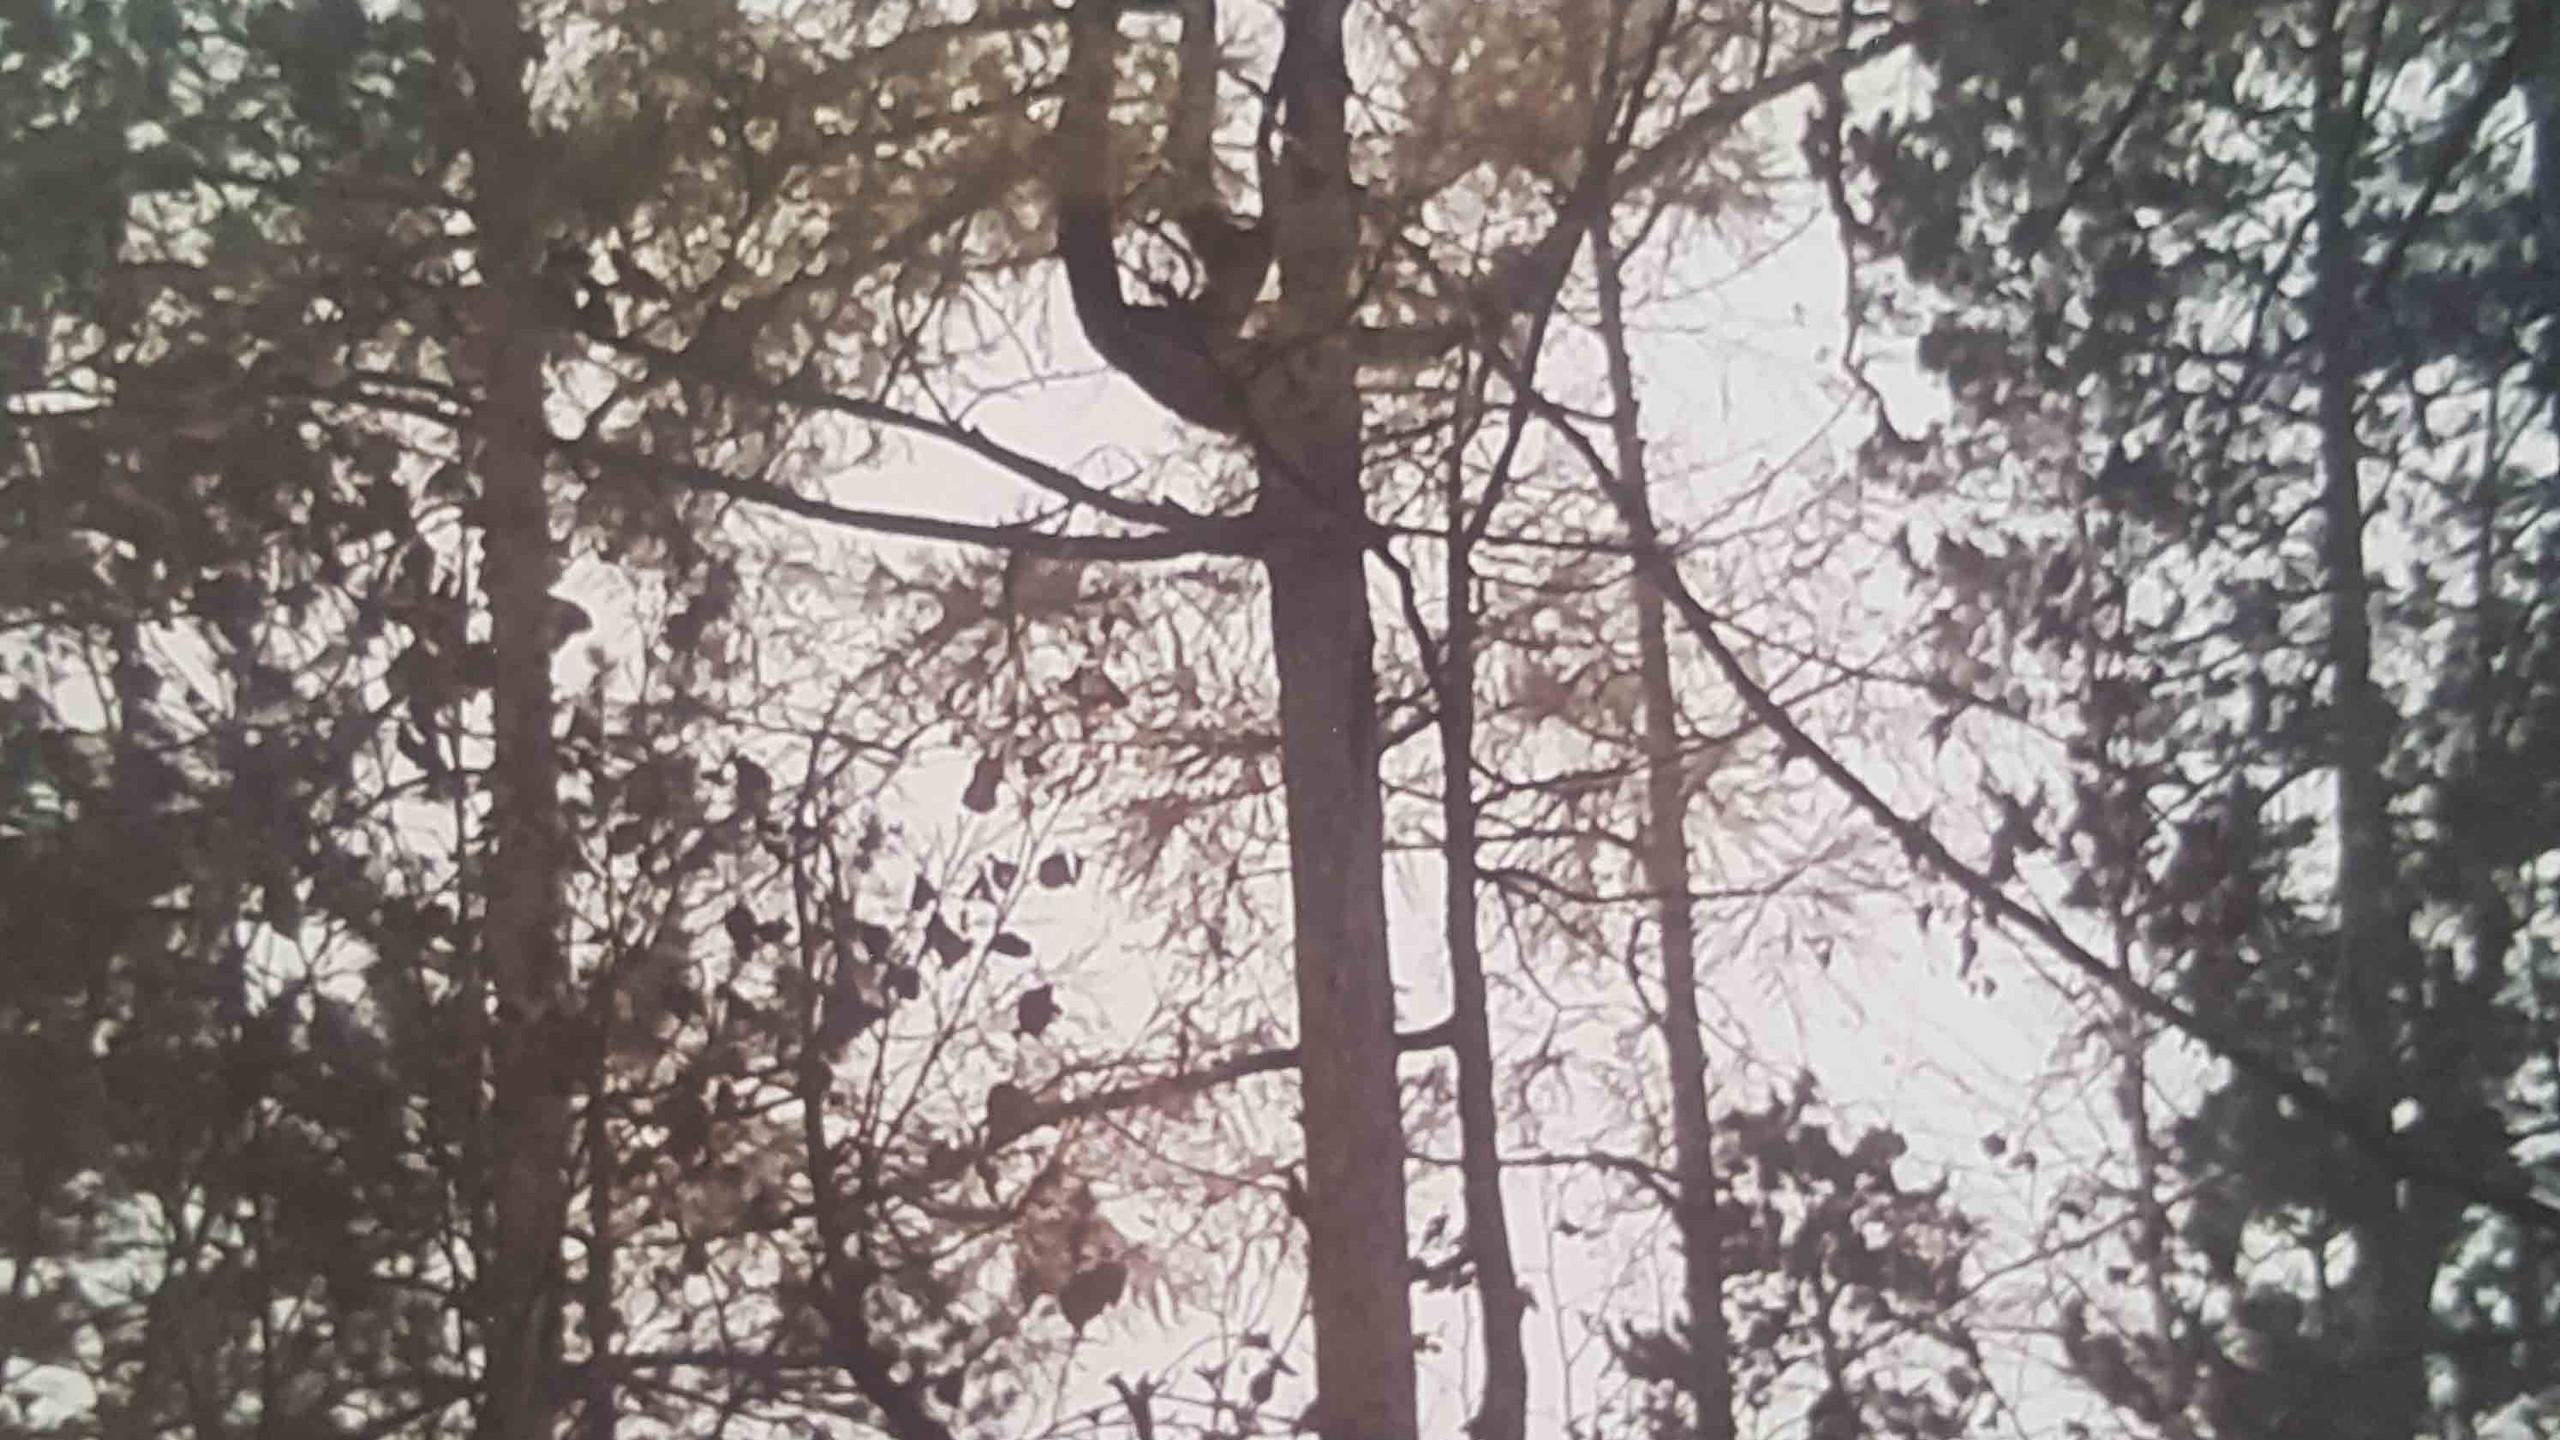 Синицина Арина 5 лет Лесной трезубец